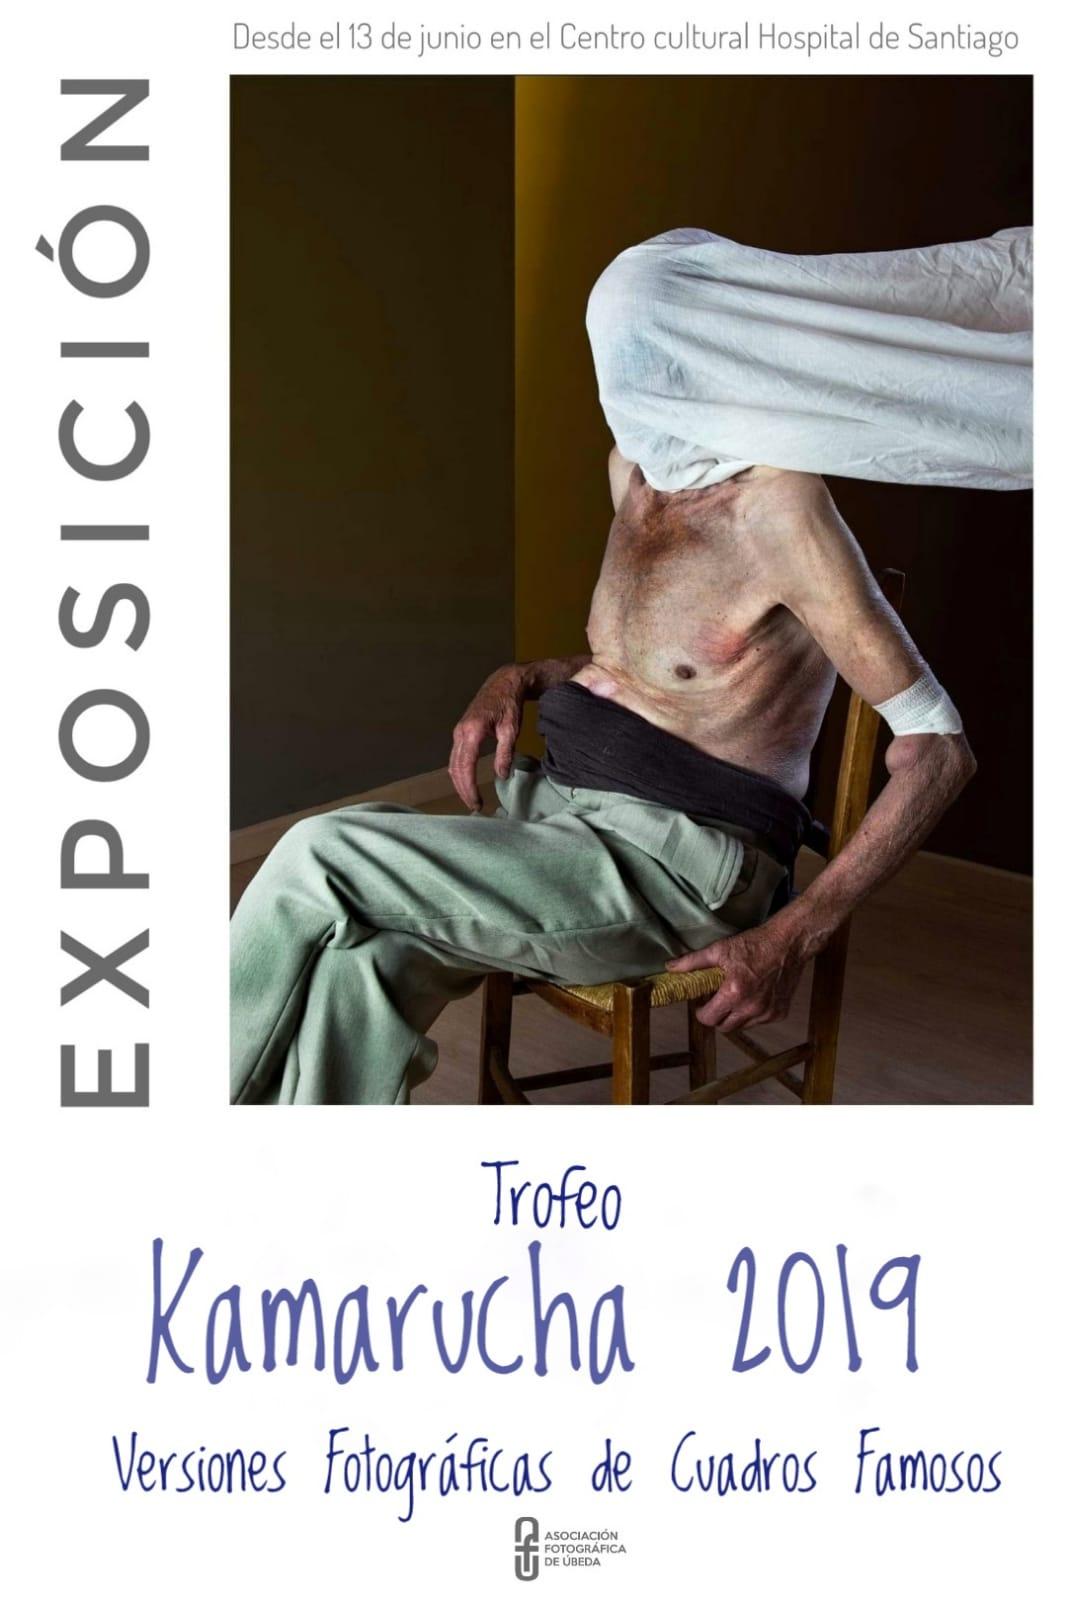 Exposición Trofeo Kamarucha 2019